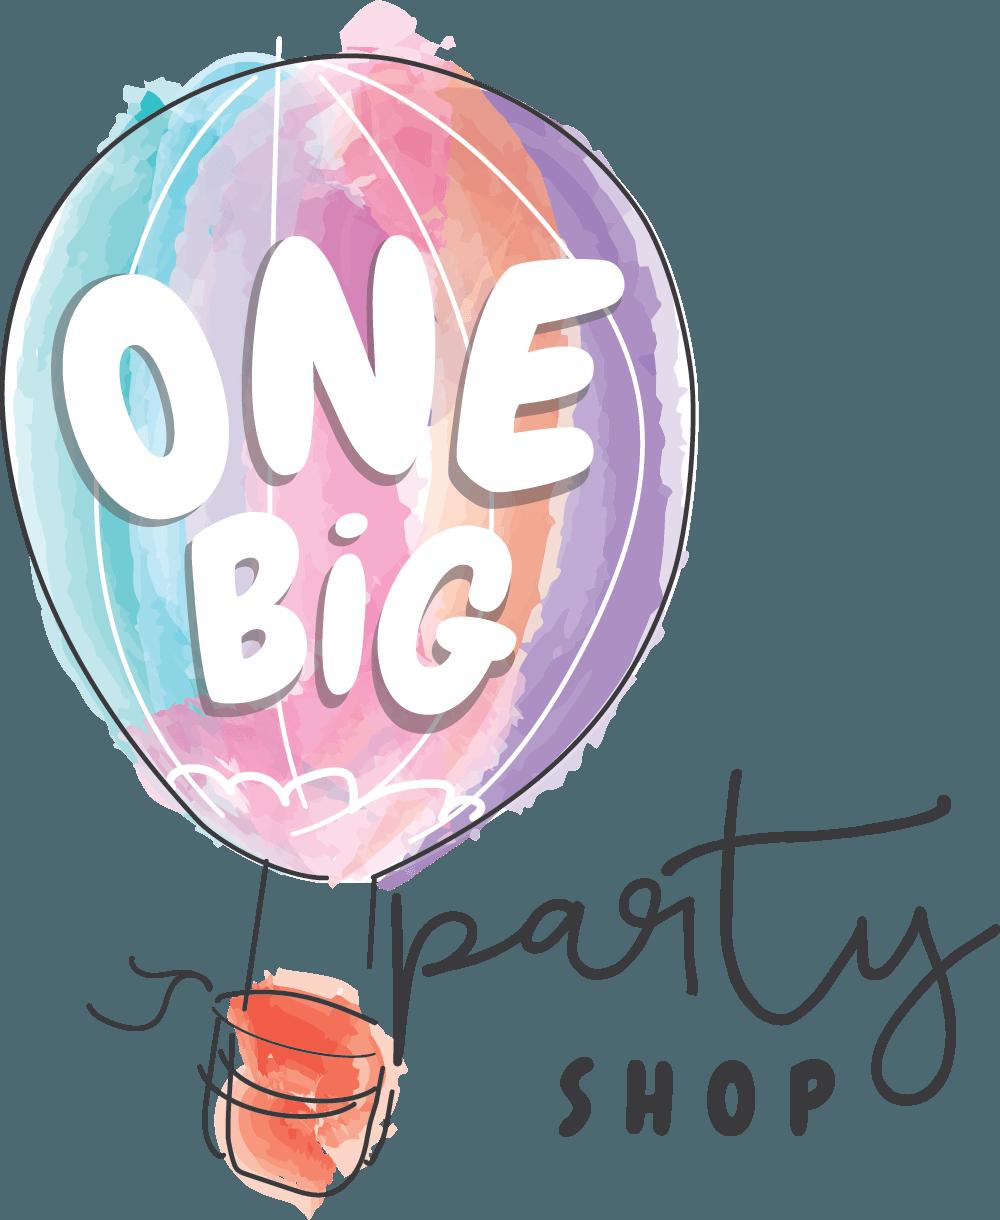 Cinco de Mayo Fiesta Clipart   Etsy   Clip art, Girl clipart, Cinco de mayo